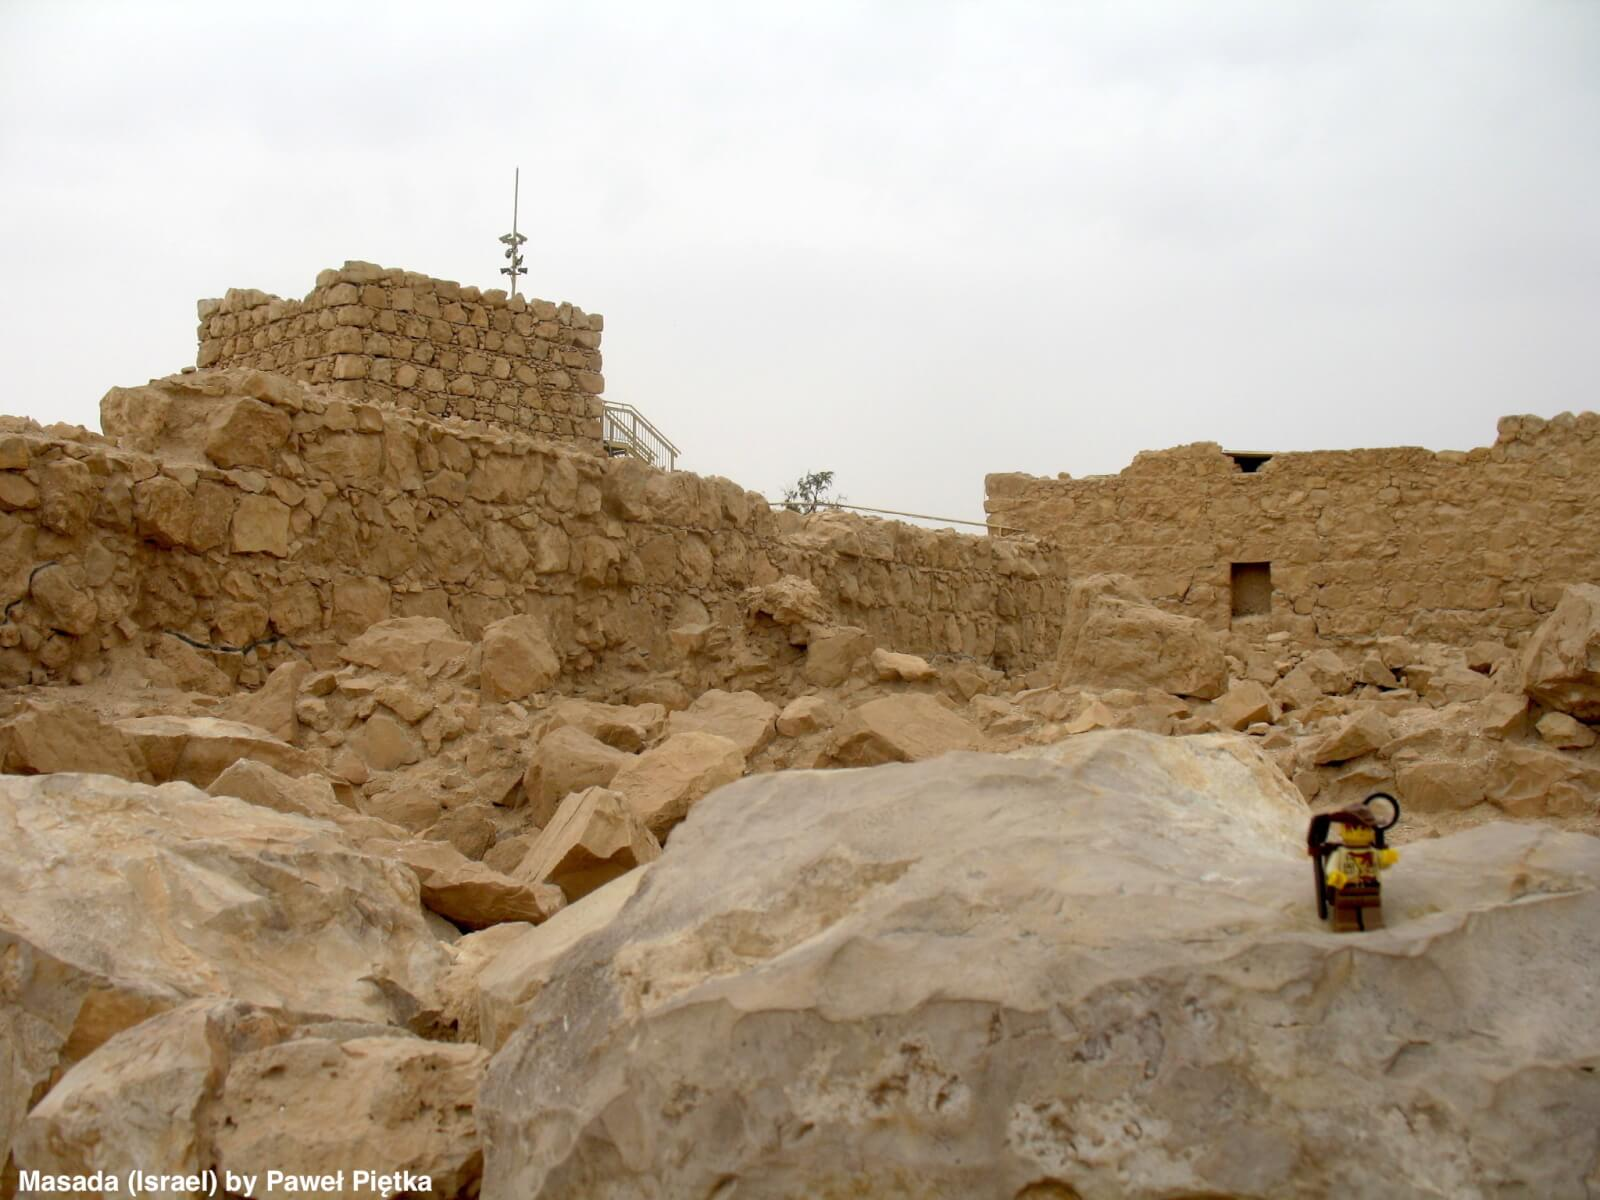 Masada (Israel) - Fortress 1